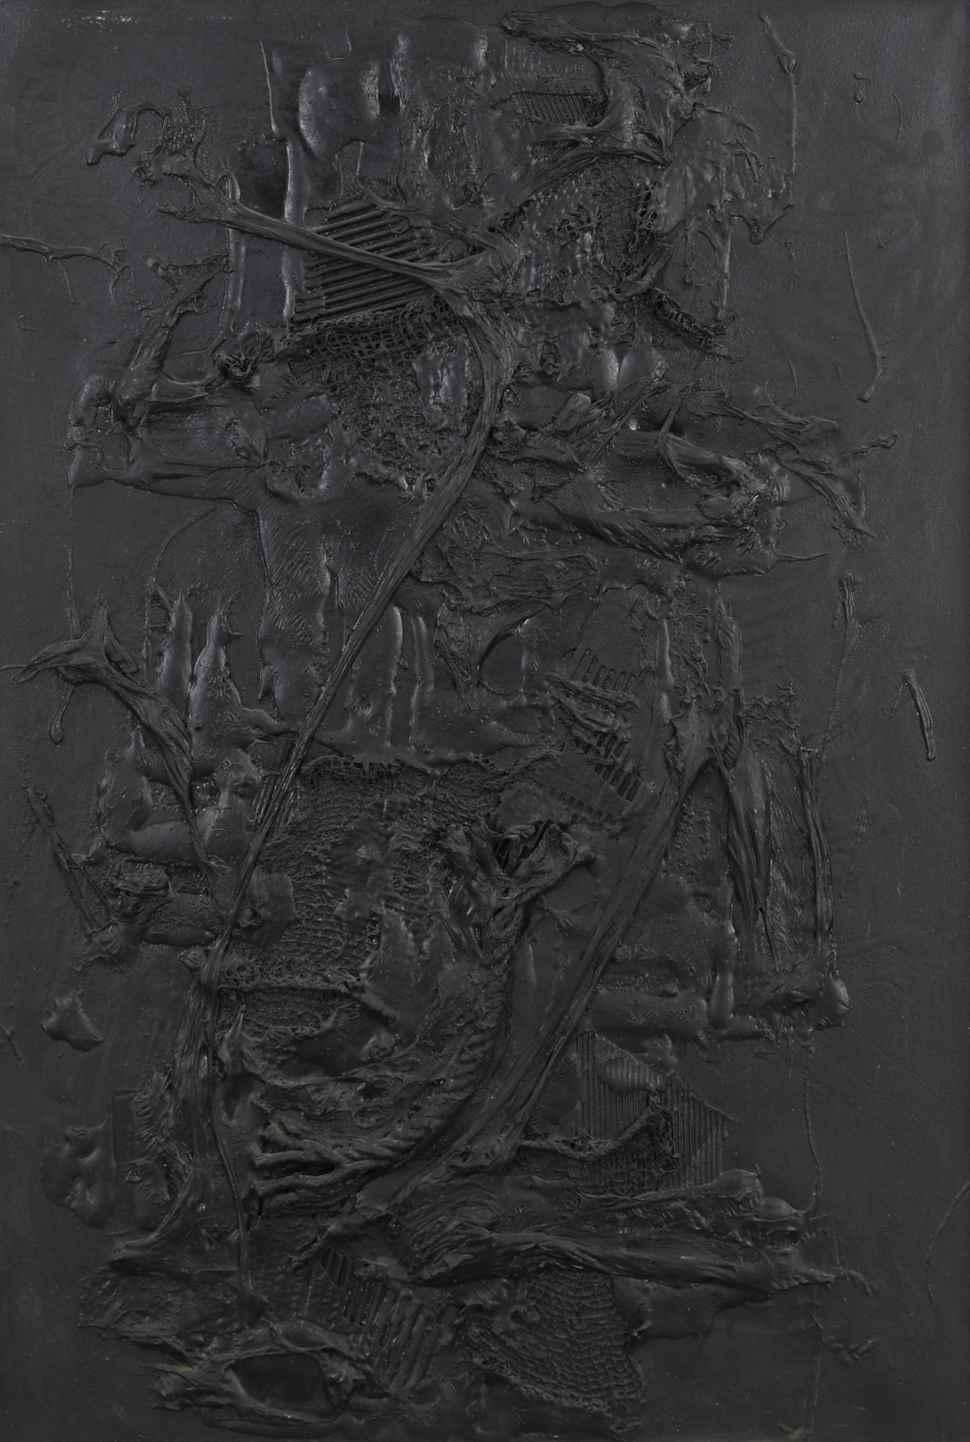 Composition - Aika Brown (1937 - 1964)